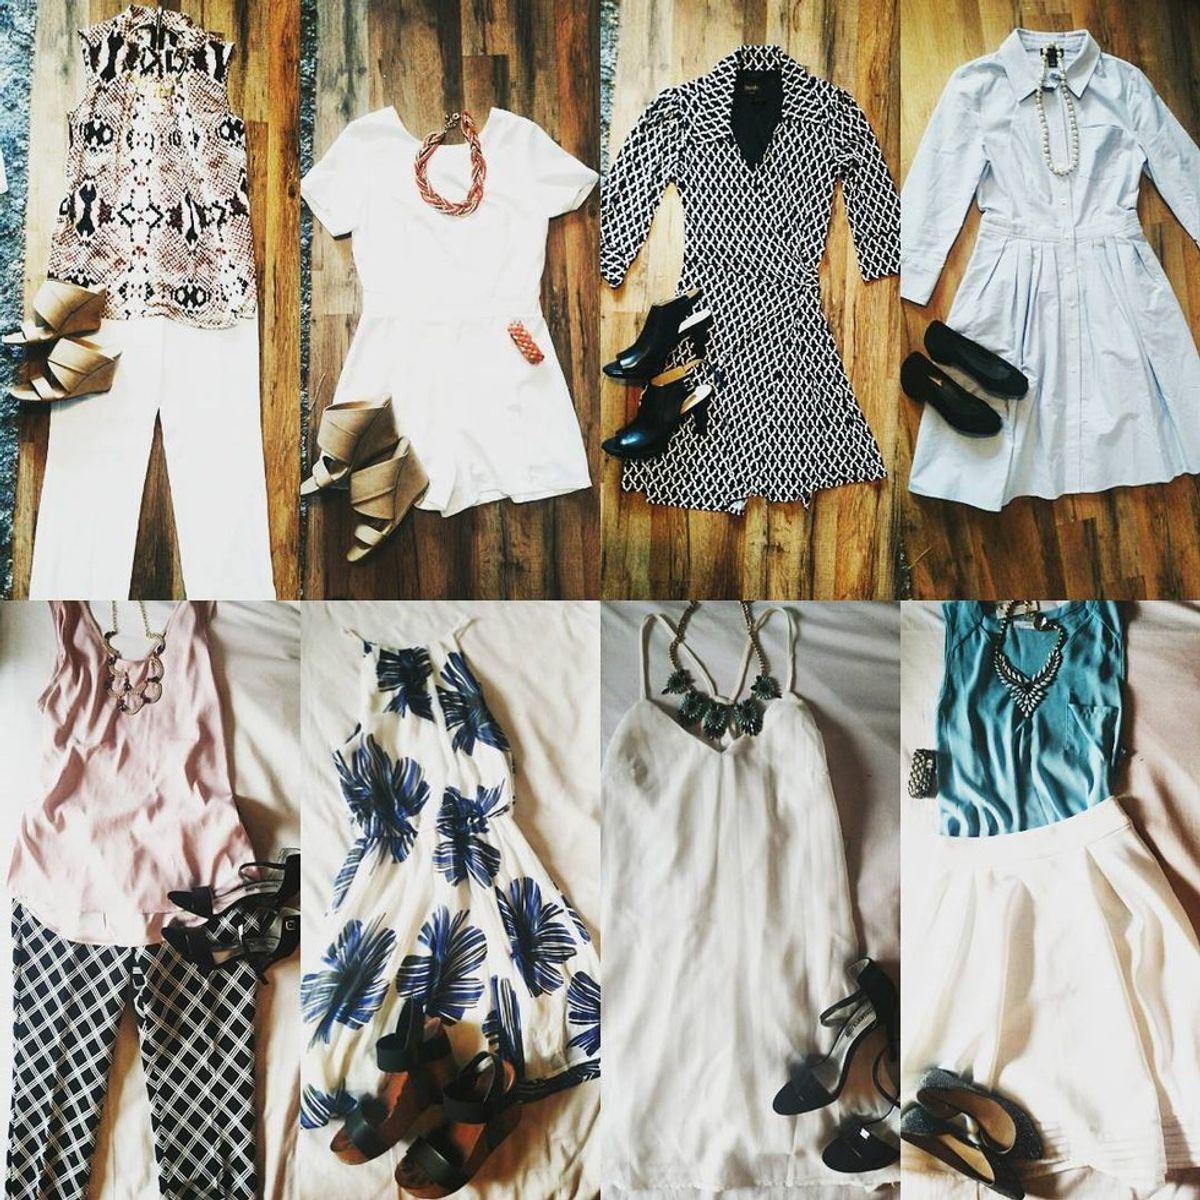 Beauty & Brains: How Fashion Has Improved My Organization